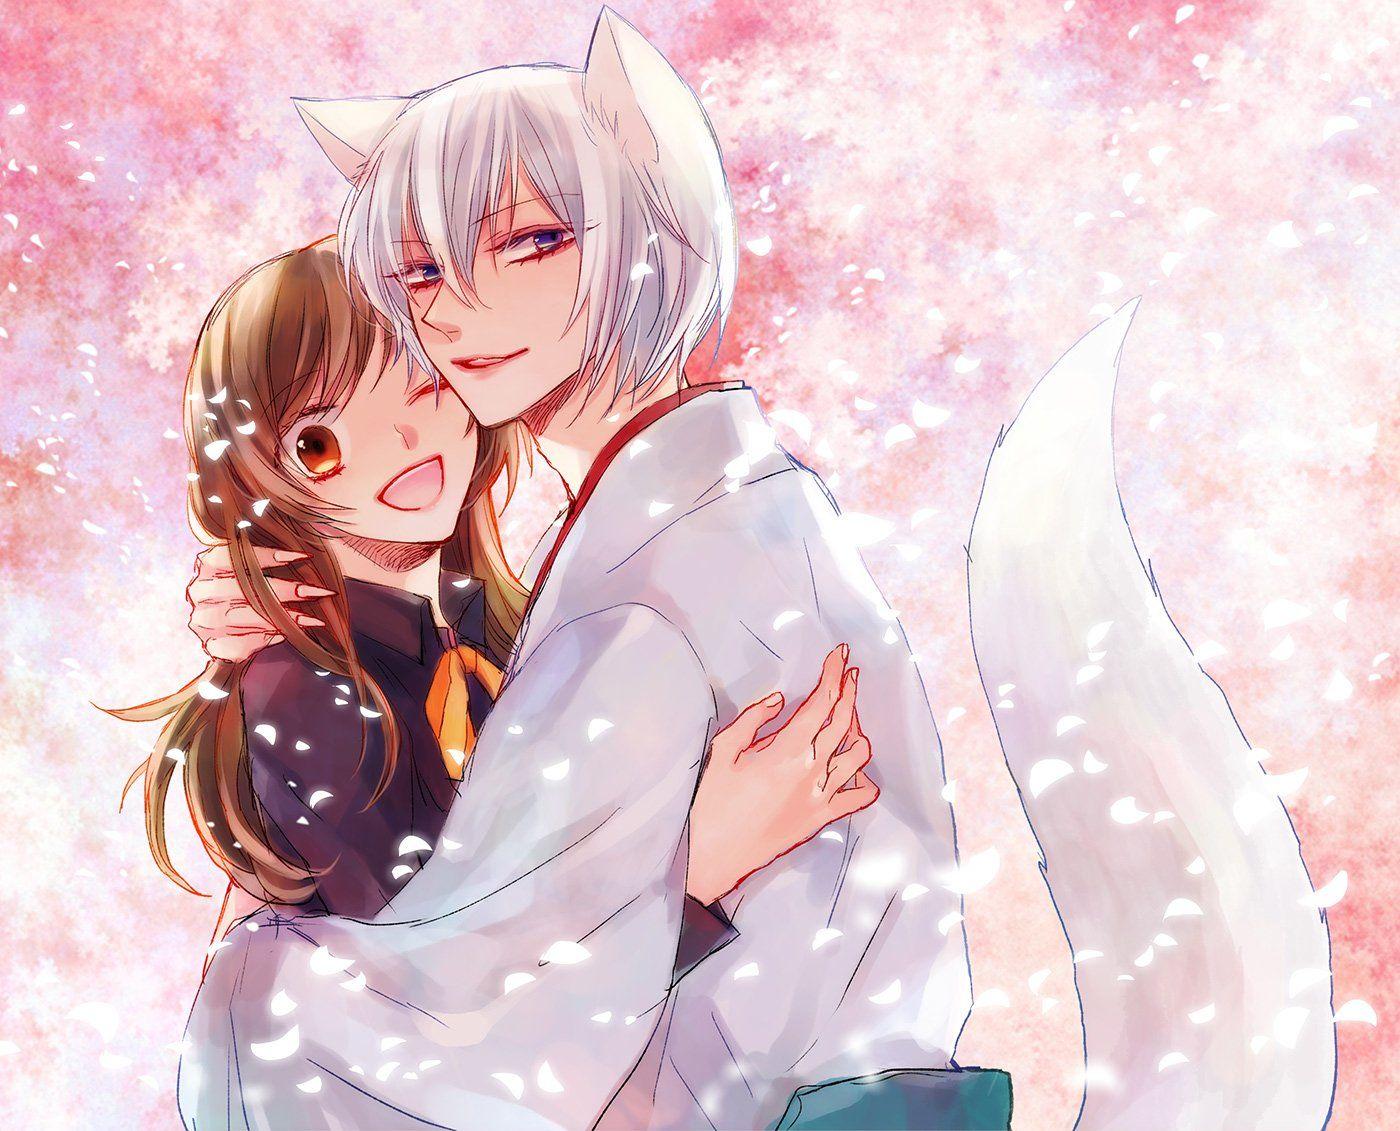 kamisama kiss cover Anime Kamisama Kiss Tomoe